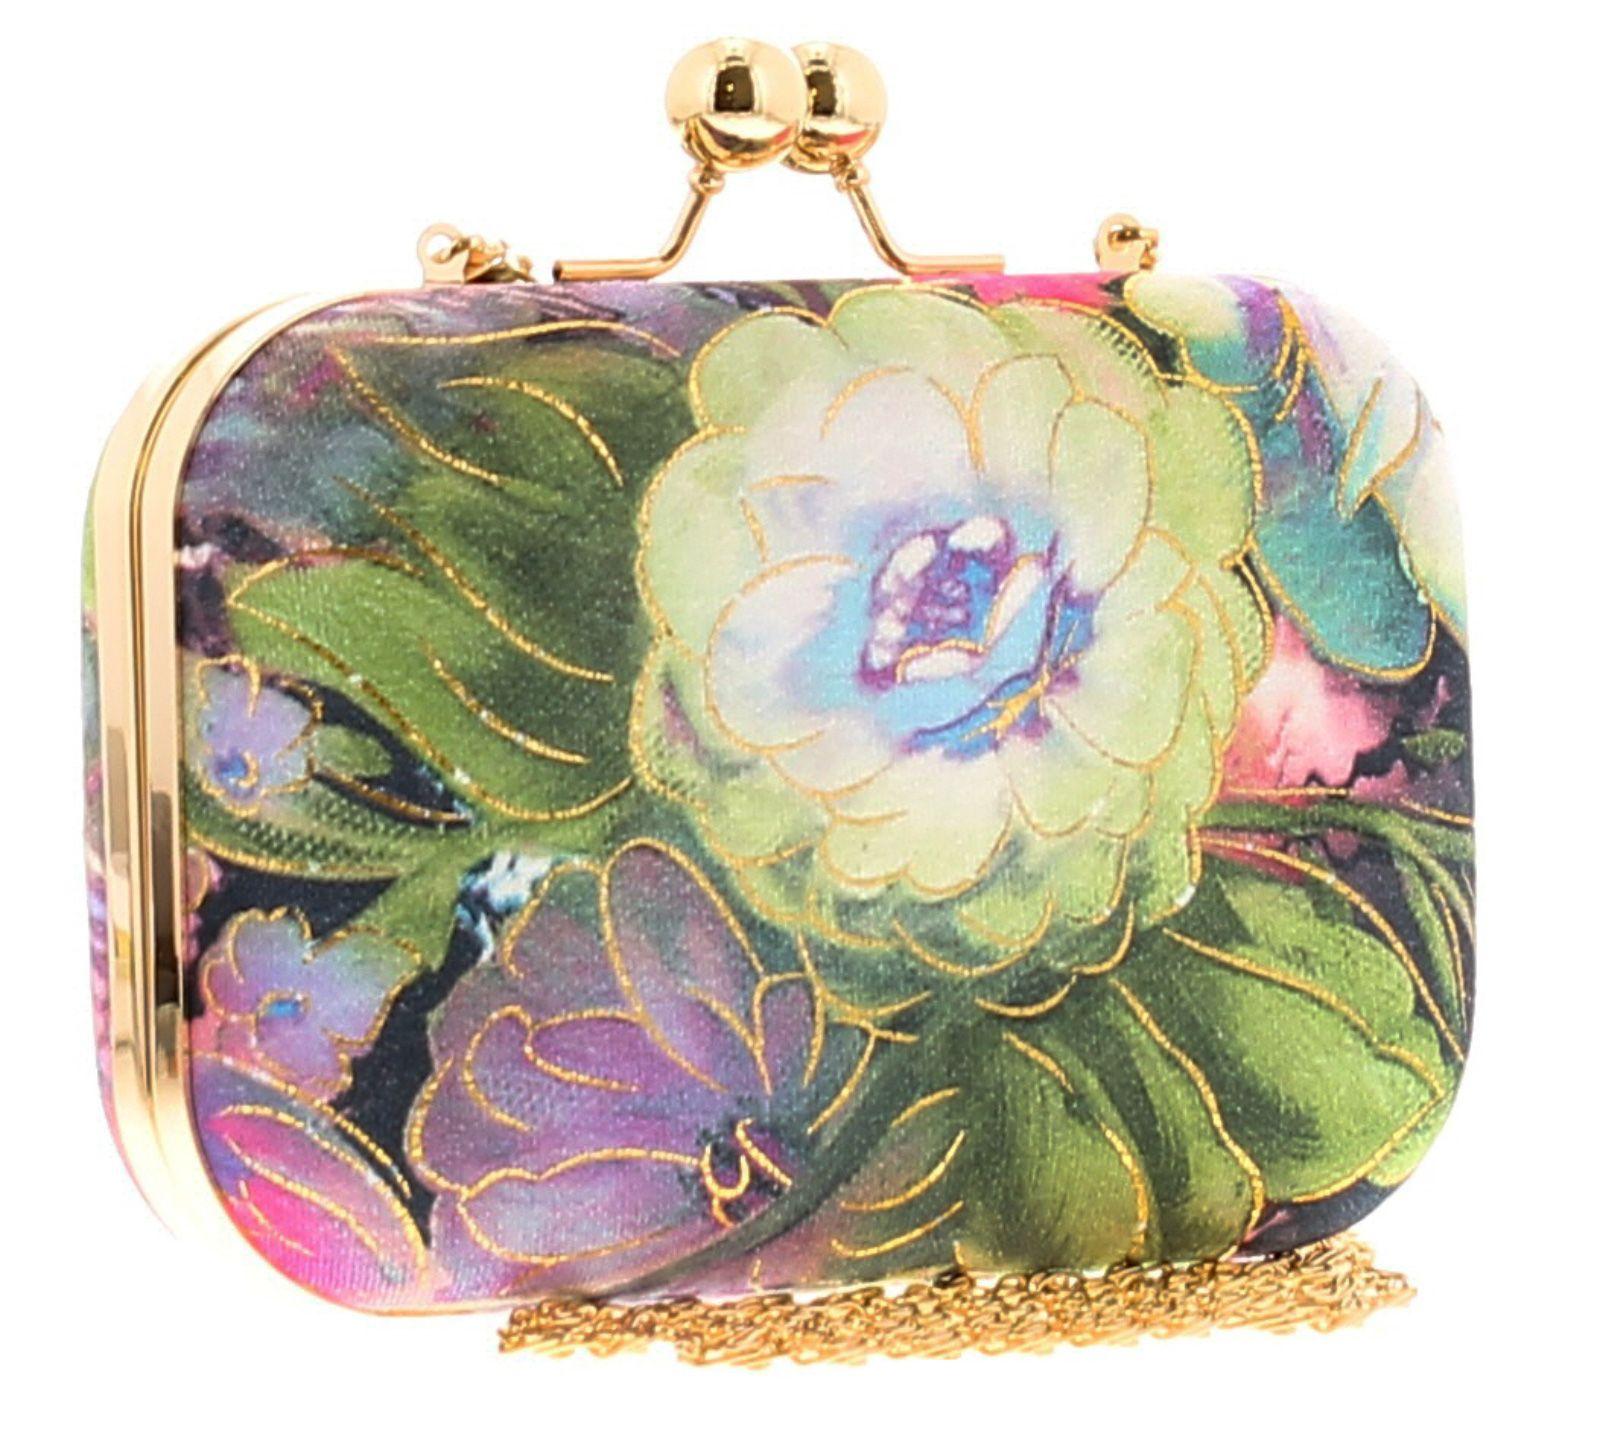 Joe Browns Couture Delilah Bag Assorted